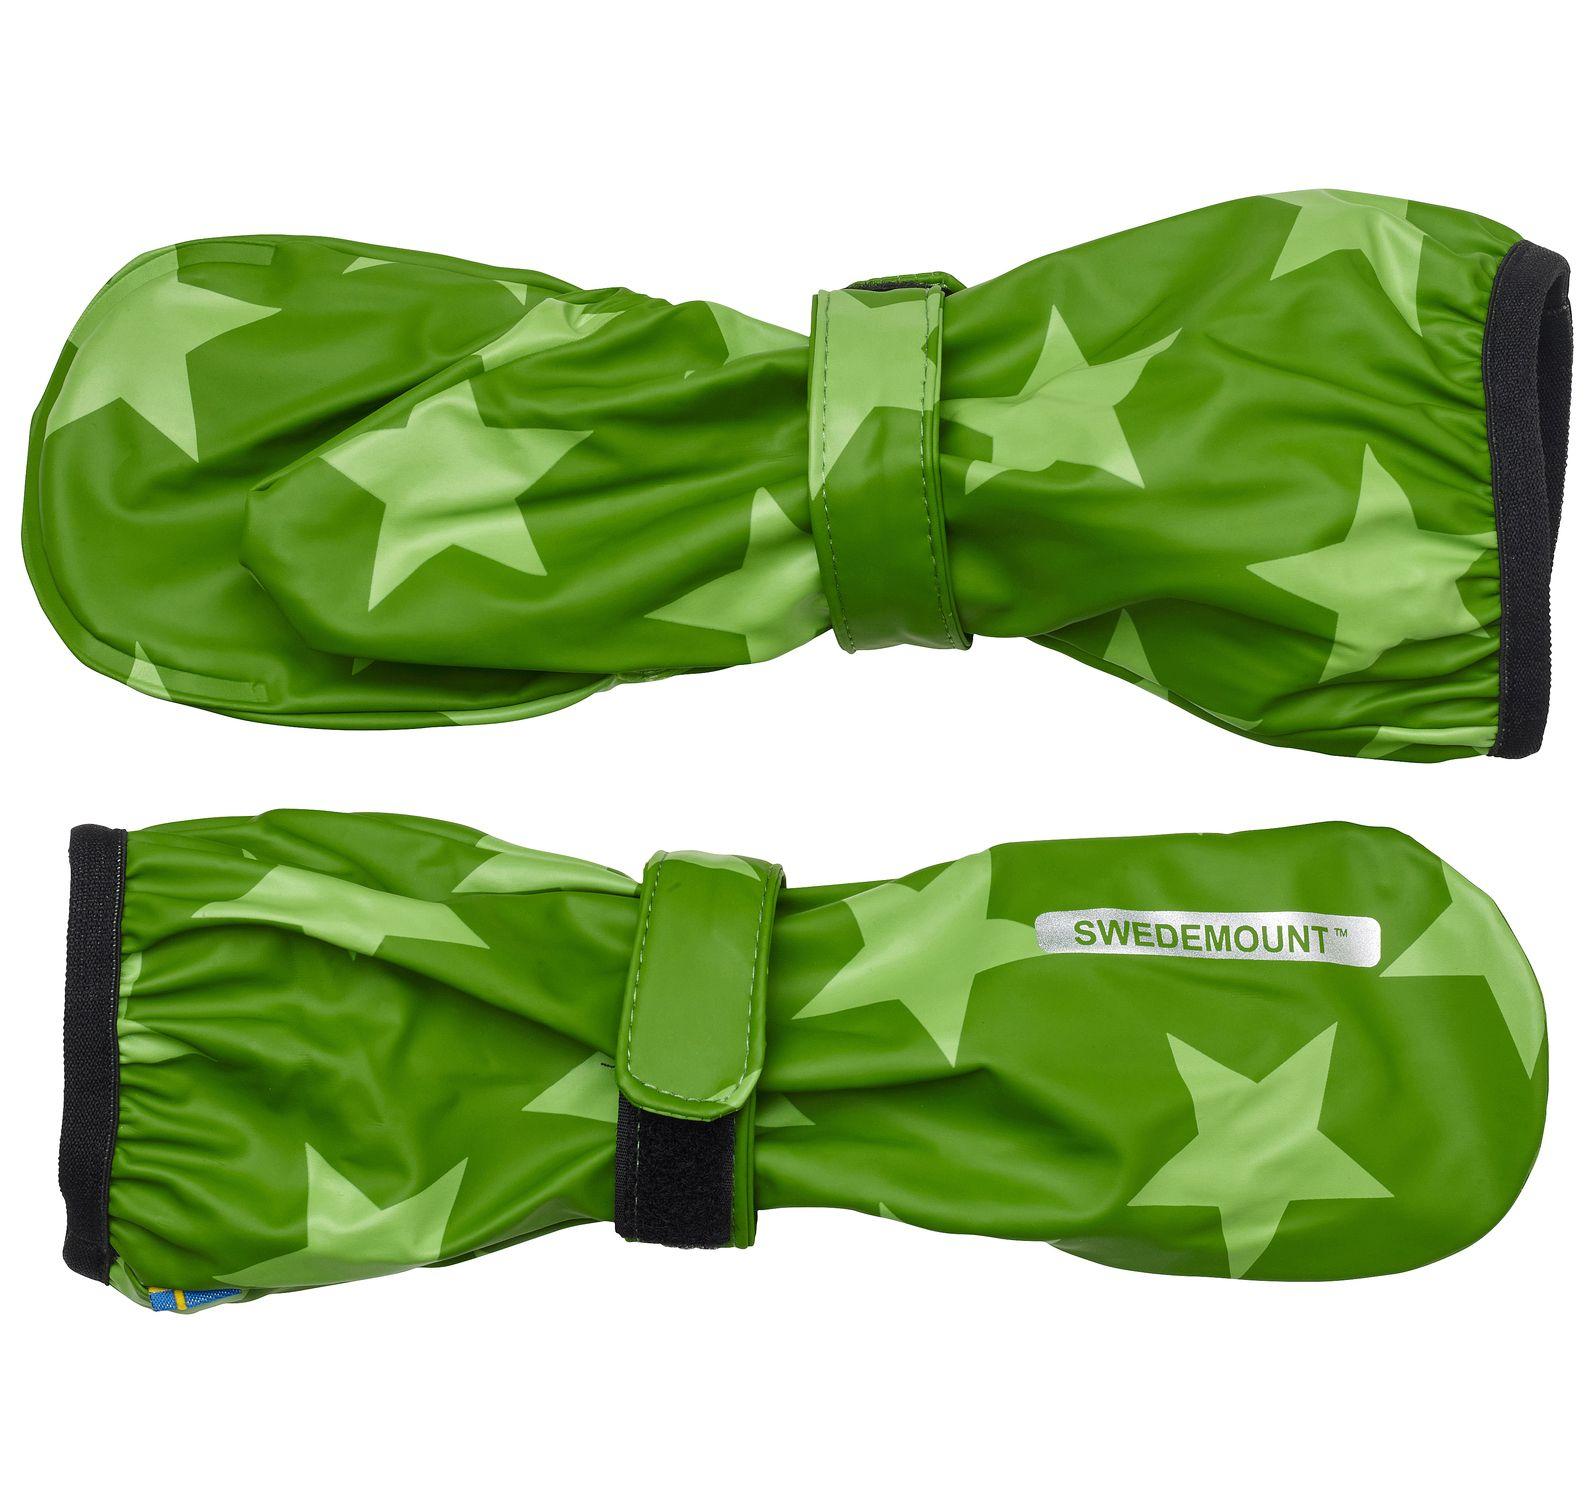 Dropp Rainglove, Dk Green/Lt Green, 4-6y, Regnkläder